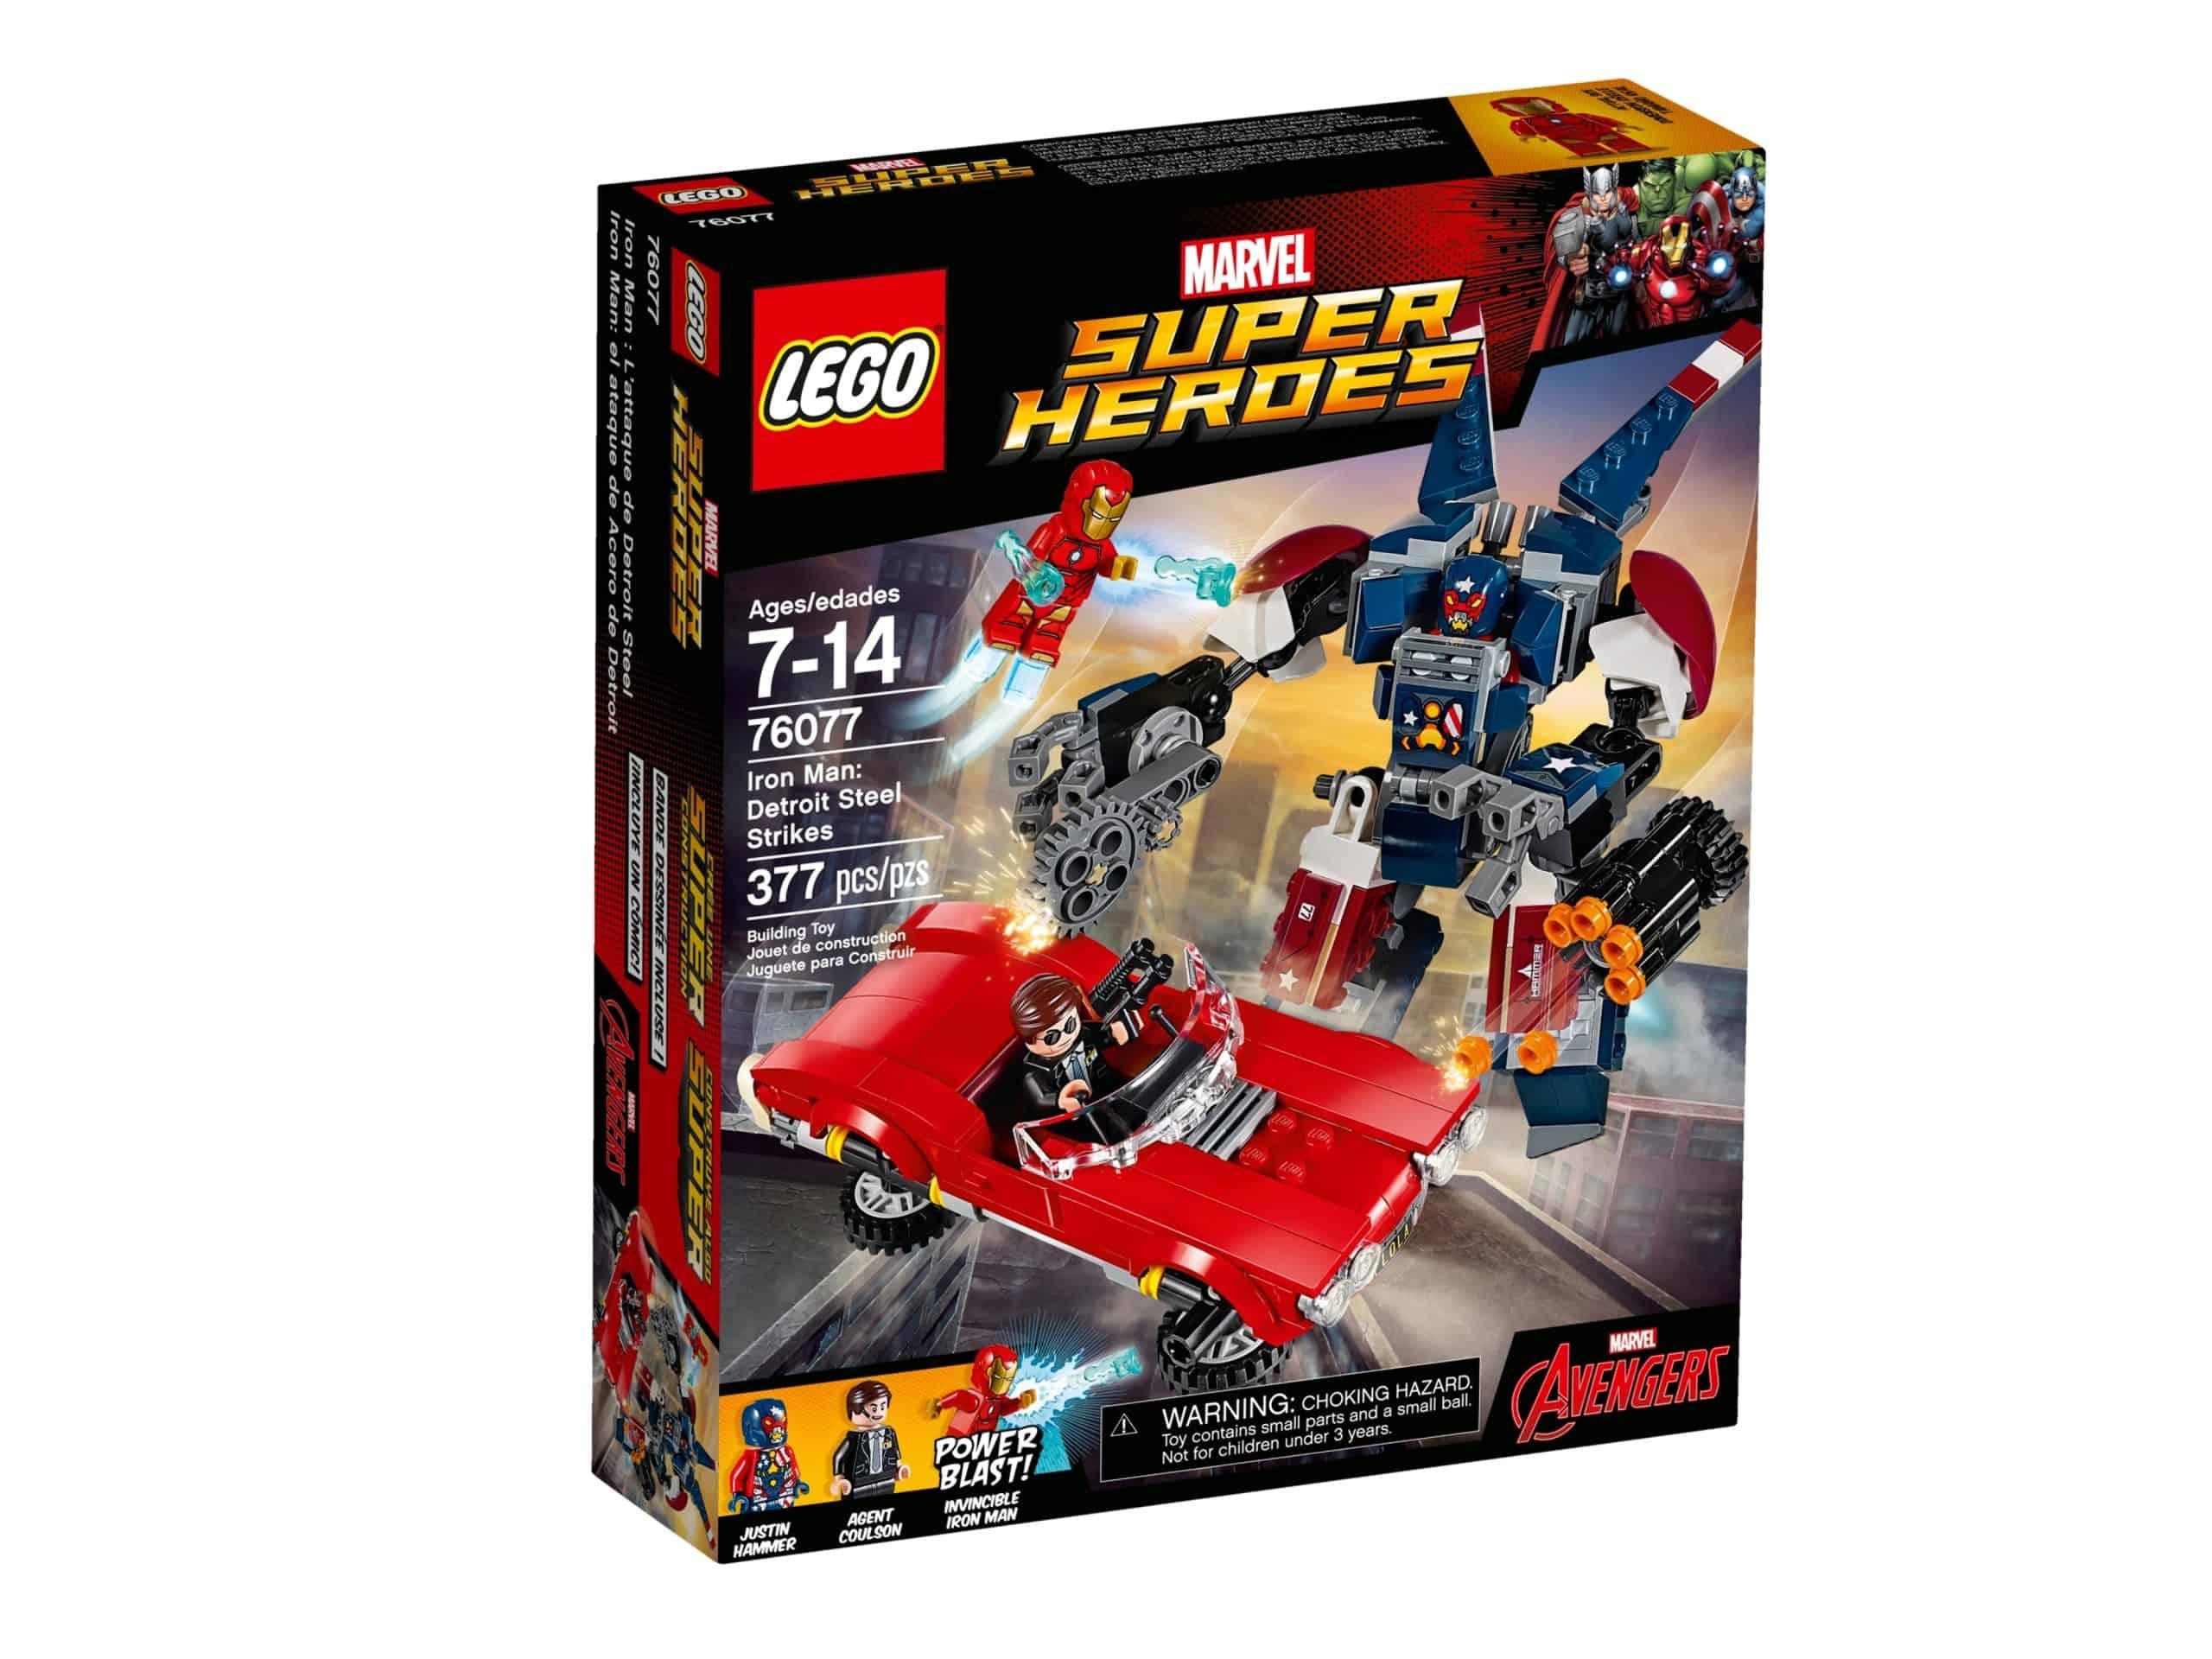 lego 76077 iron man detroit steels angreb scaled